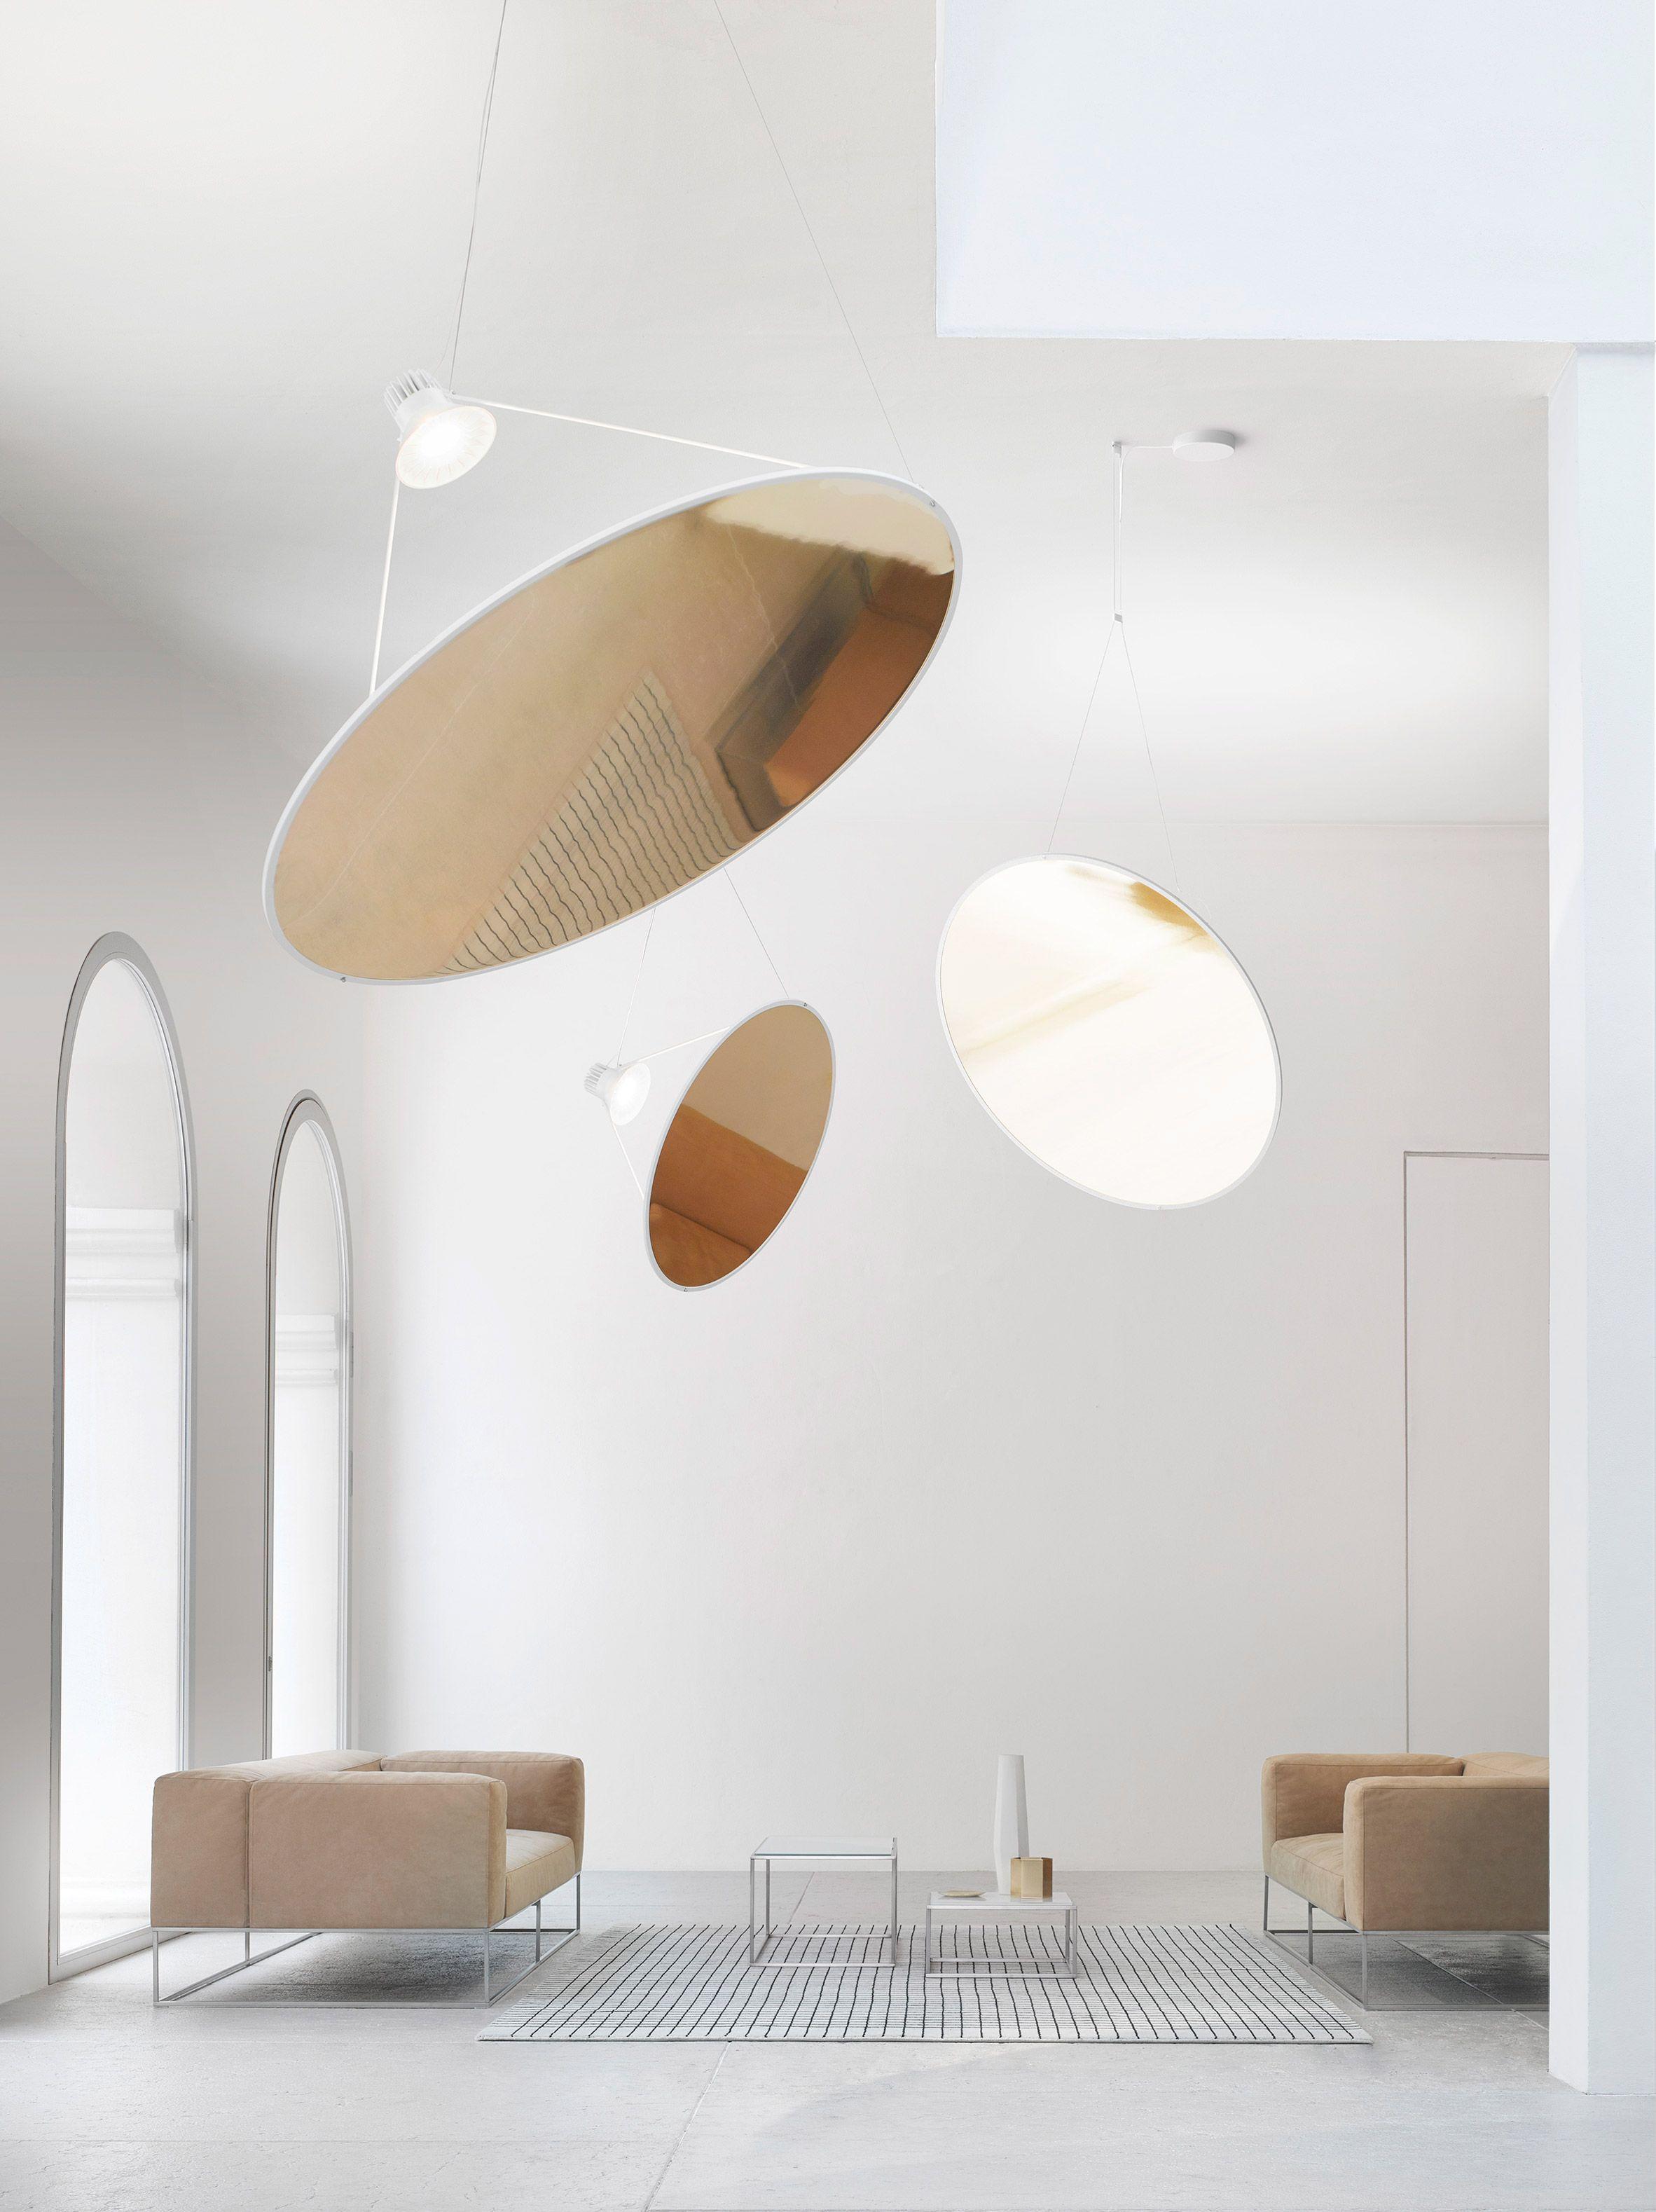 Daniel Rybakken Amisol light   Interior Design in 2019   Modern